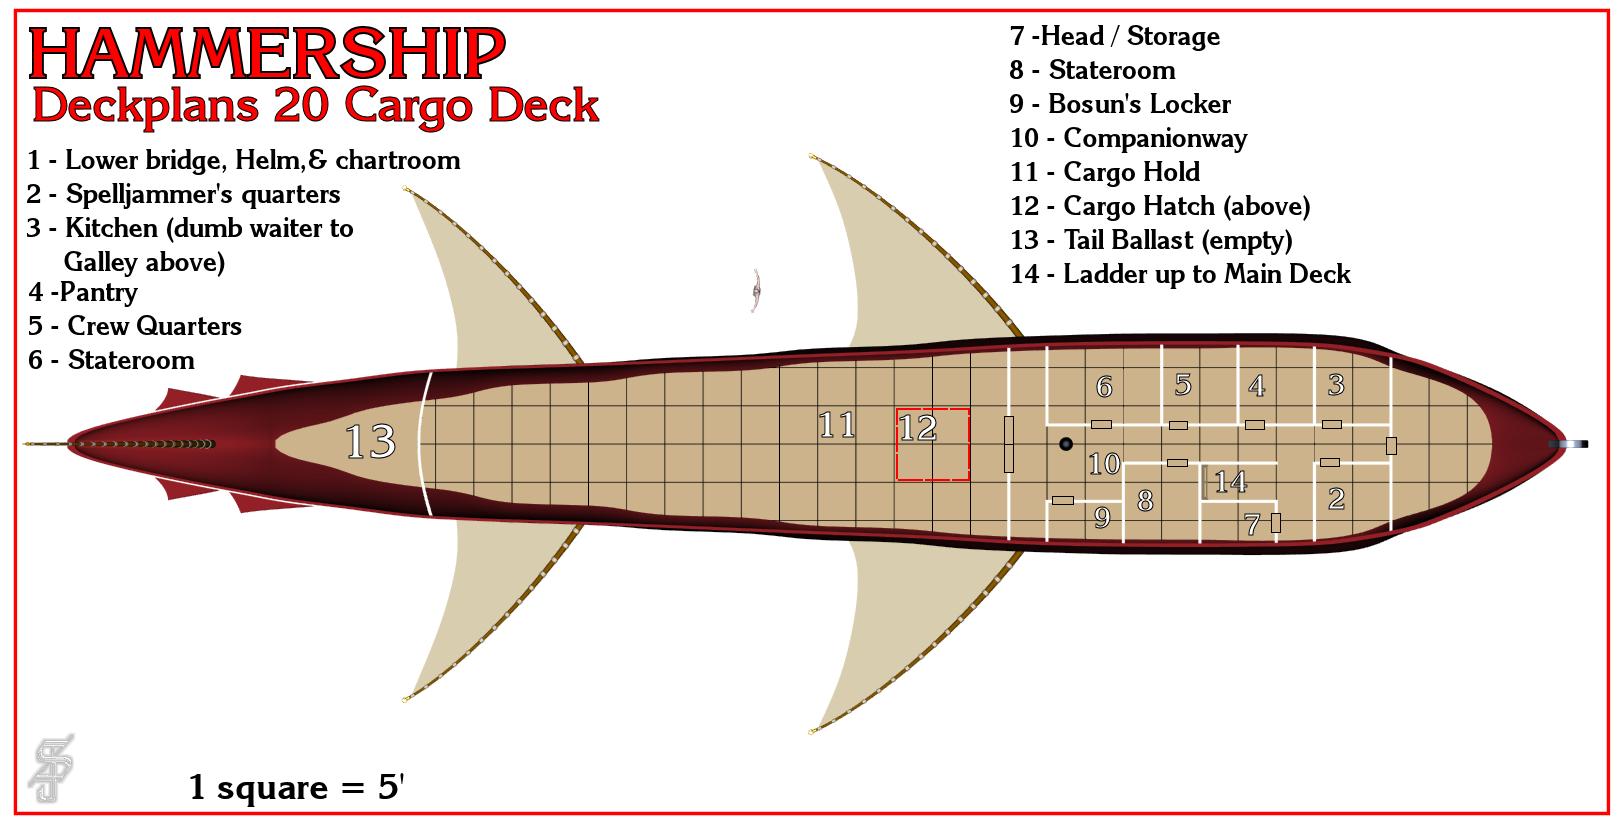 Hammership layout 20